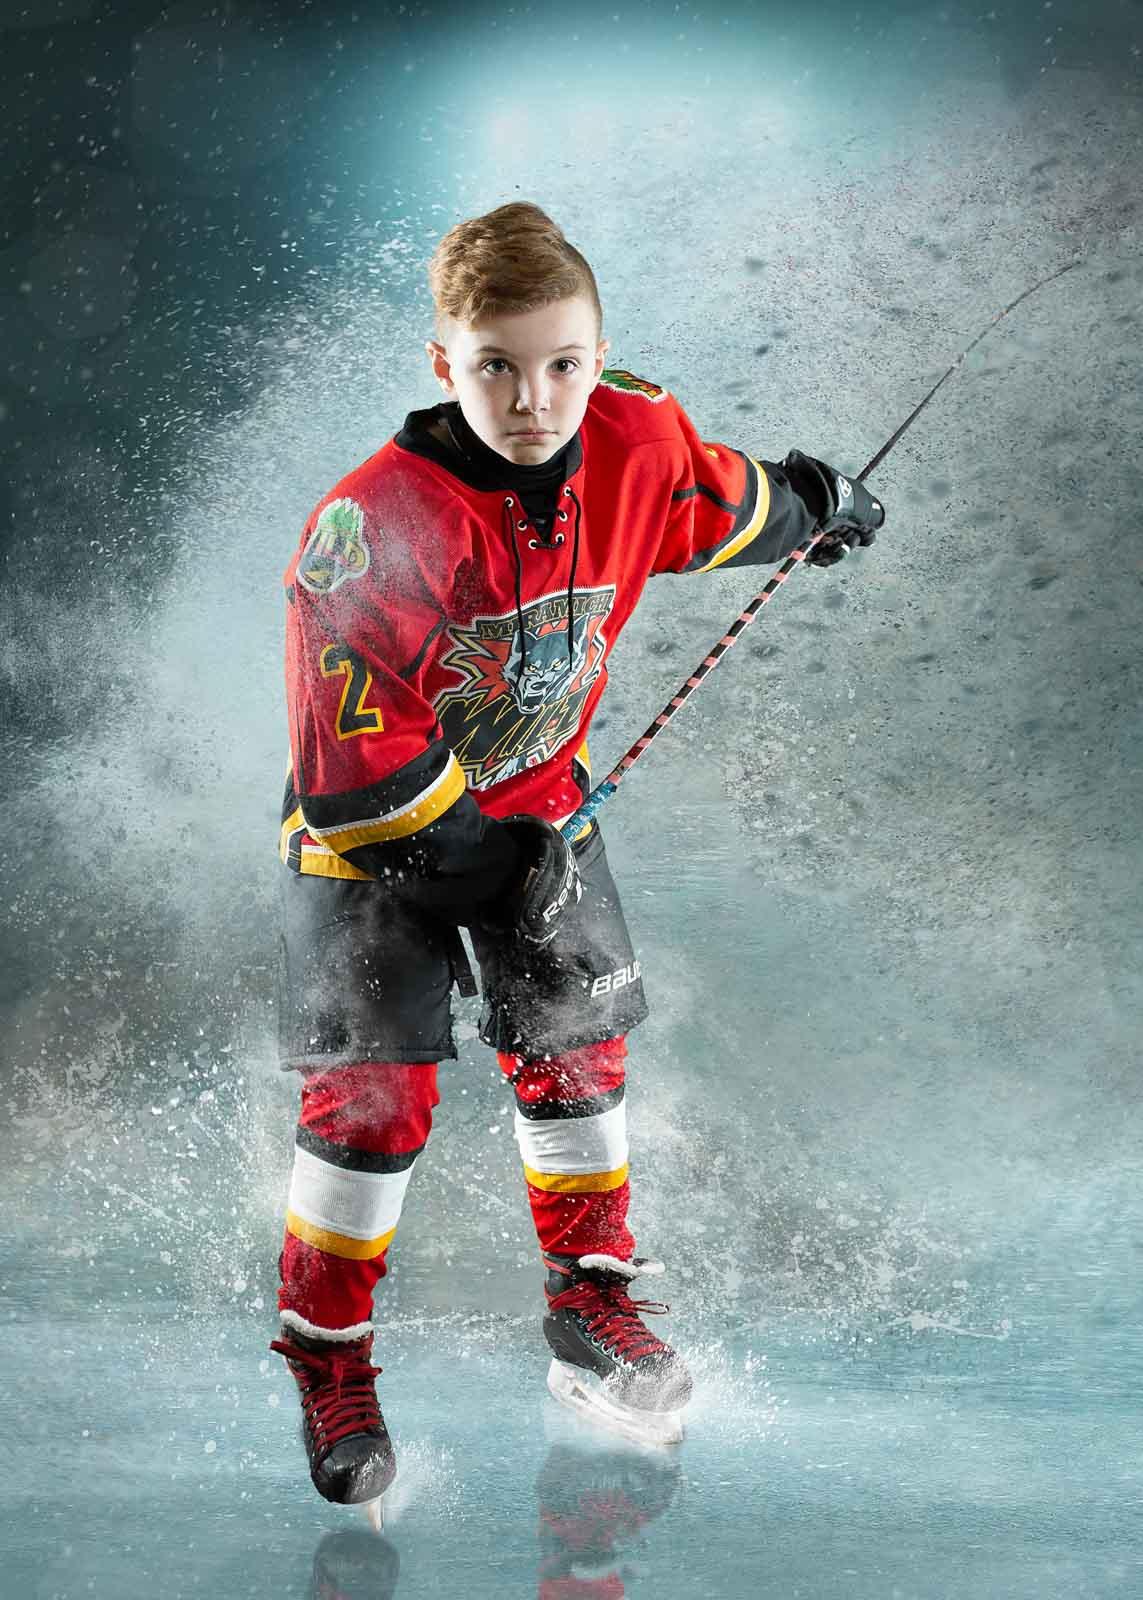 hockey player taking slapshot on ice composite